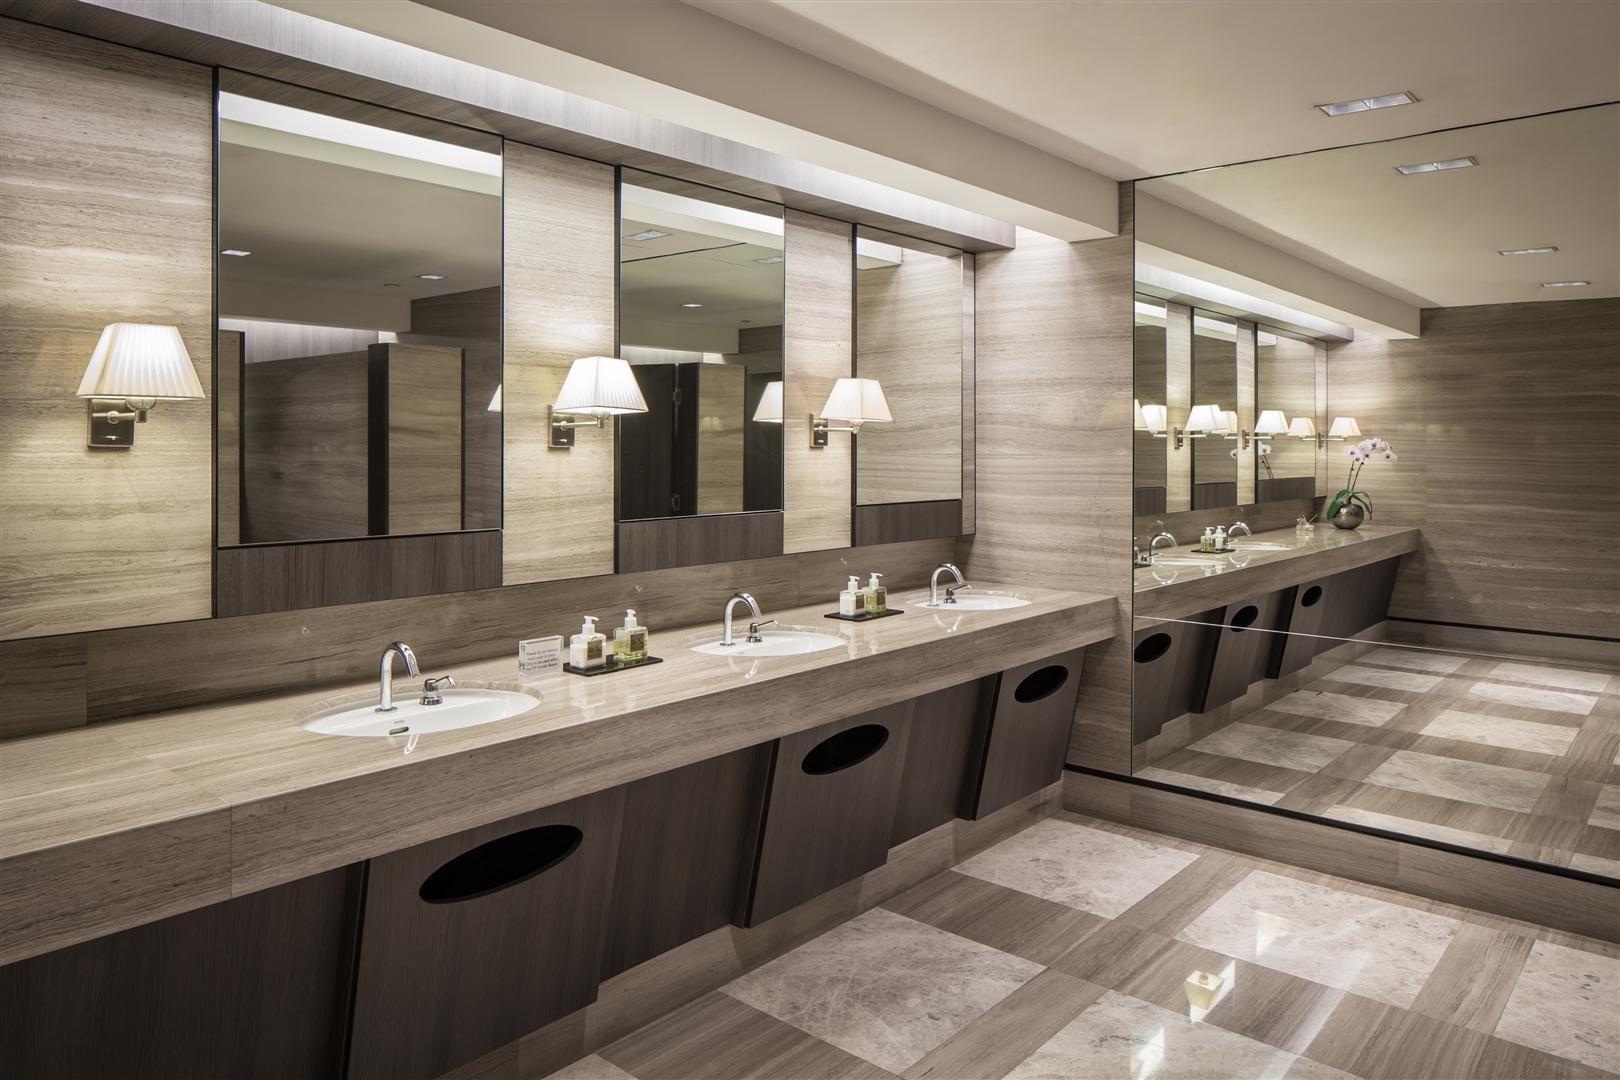 Bathroom Sign Texas Mall public toilet paragon shopping mall singaporedp design